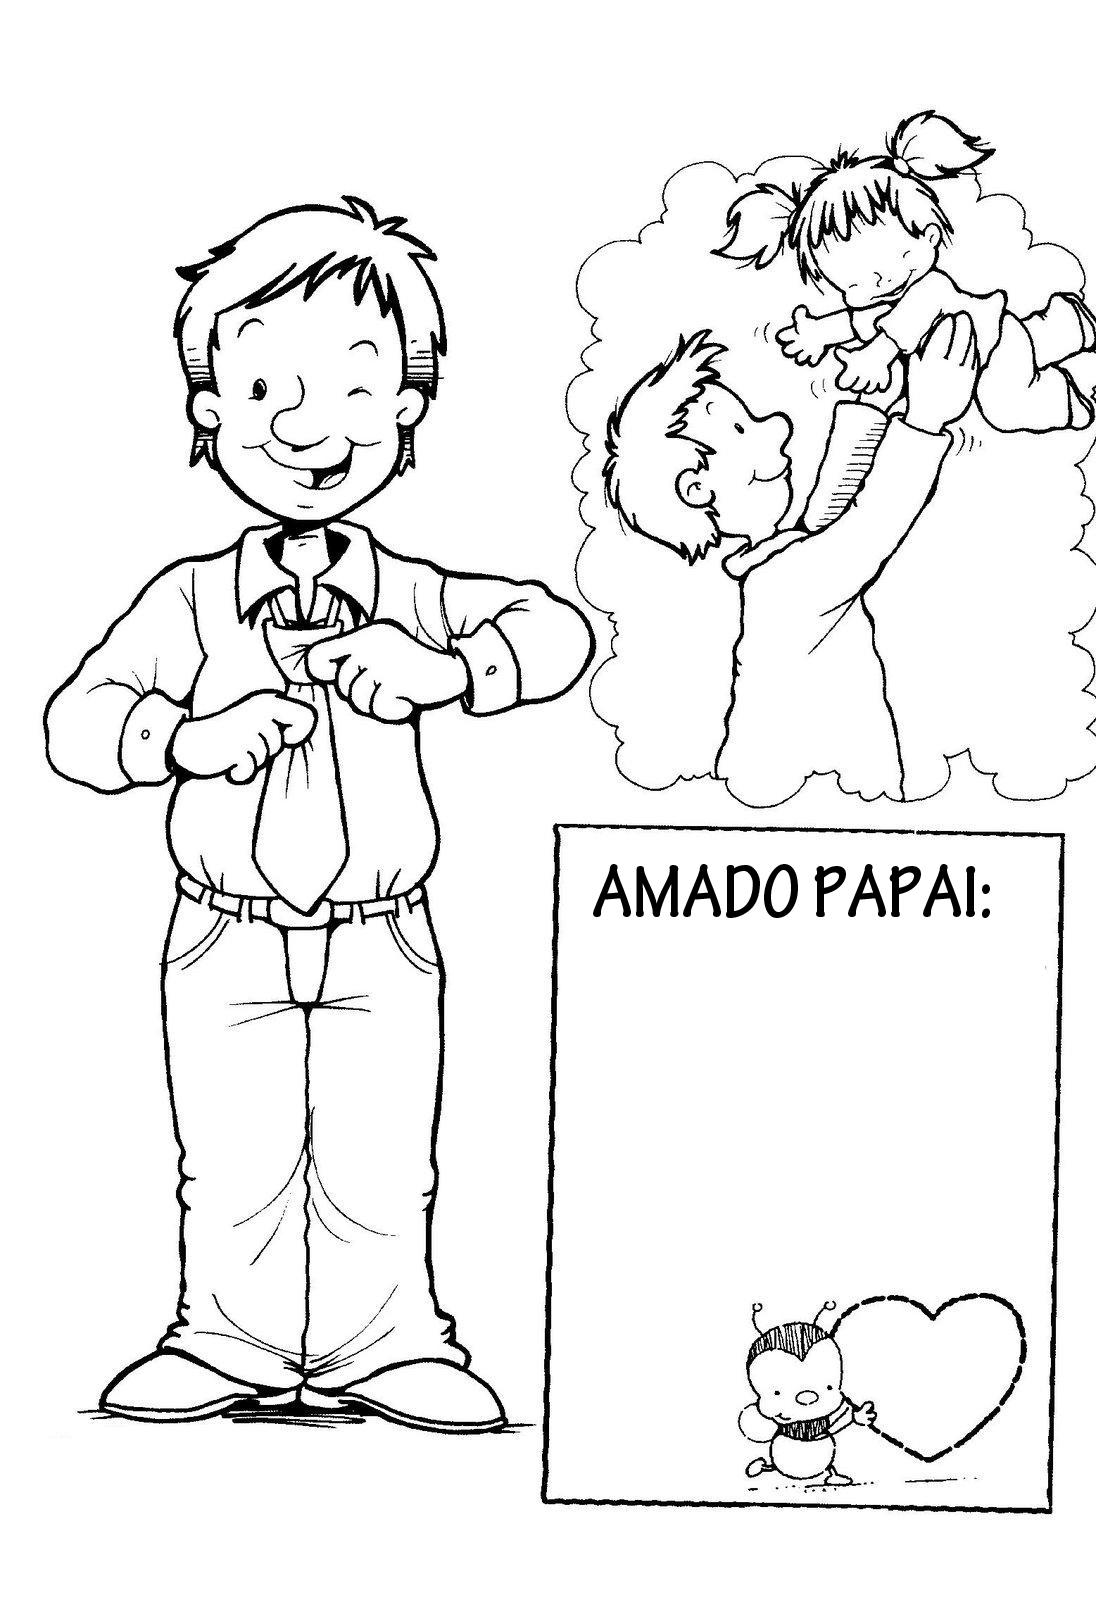 Modelos De Cartoes Para O Dia Dos Pais Para Imprimir E Colorir